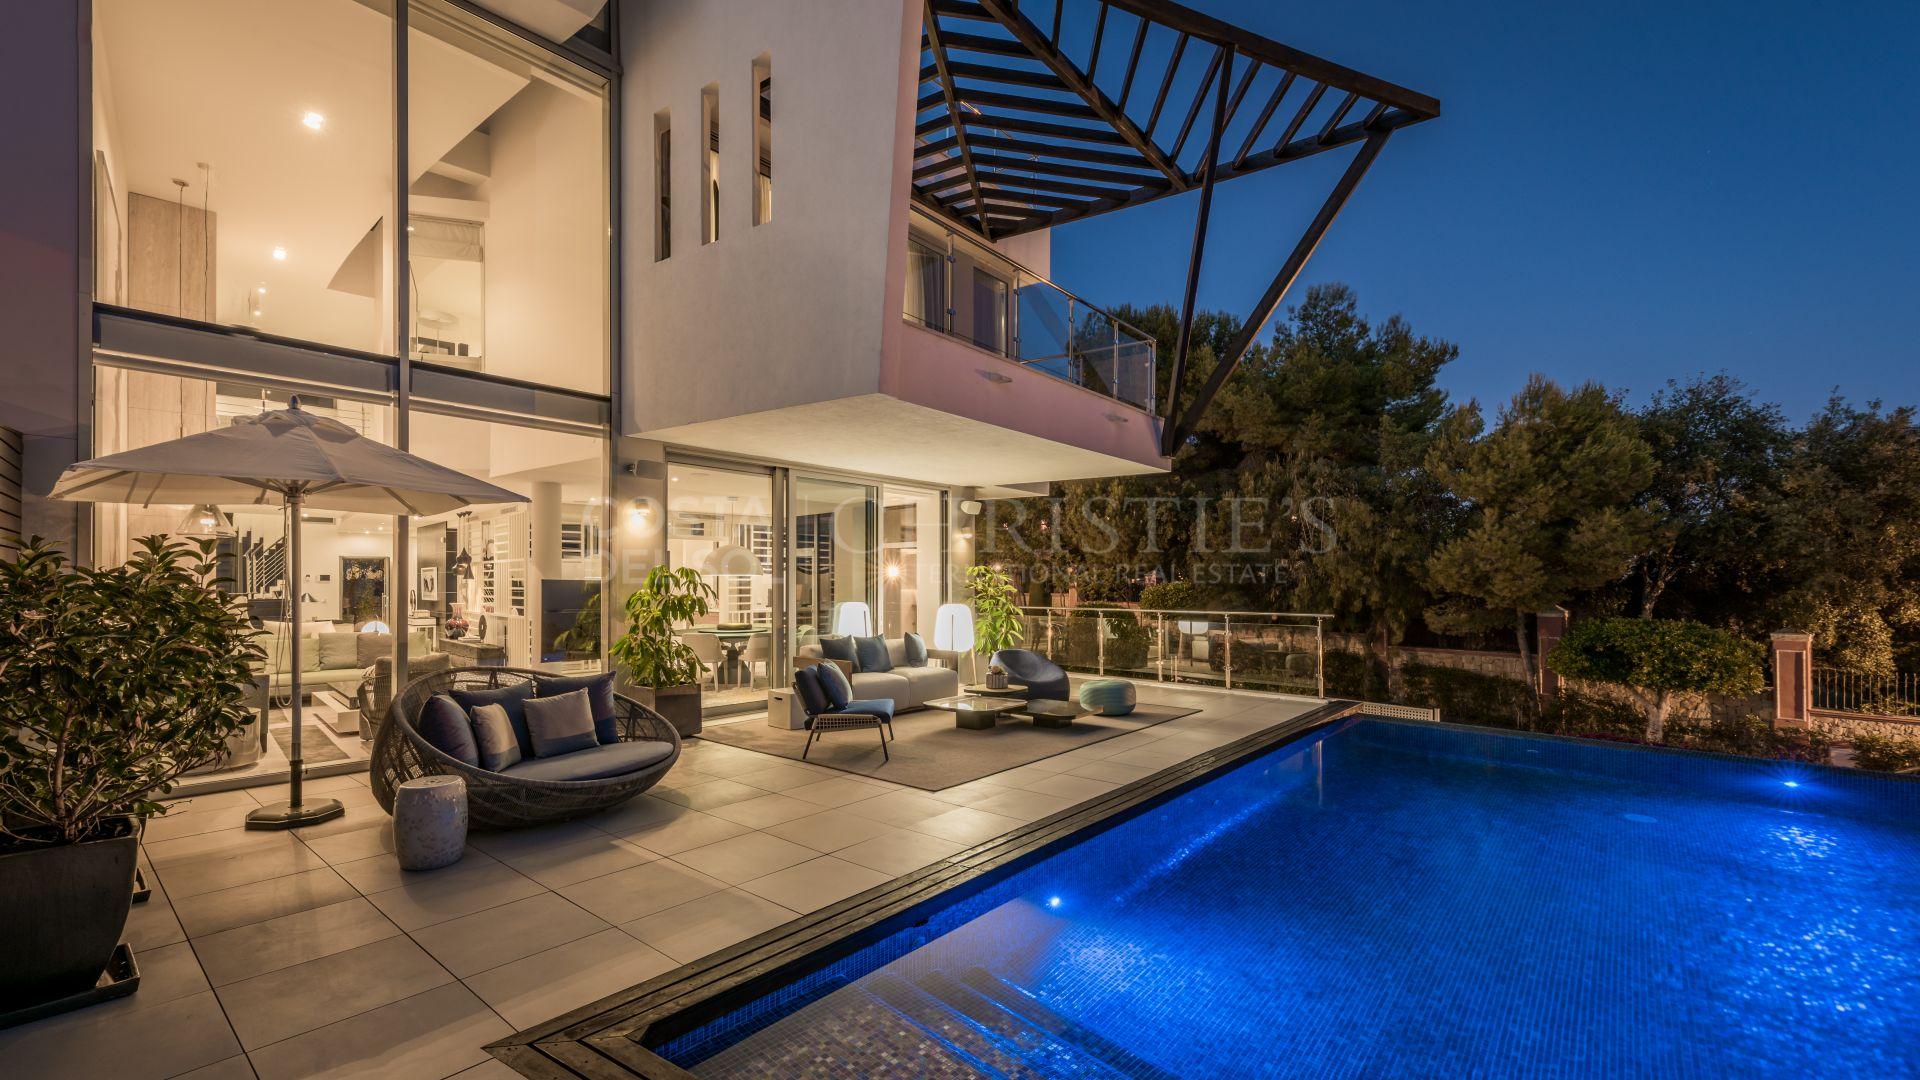 Splendorous villa in Sierra Blanca | Christie's International Real Estate